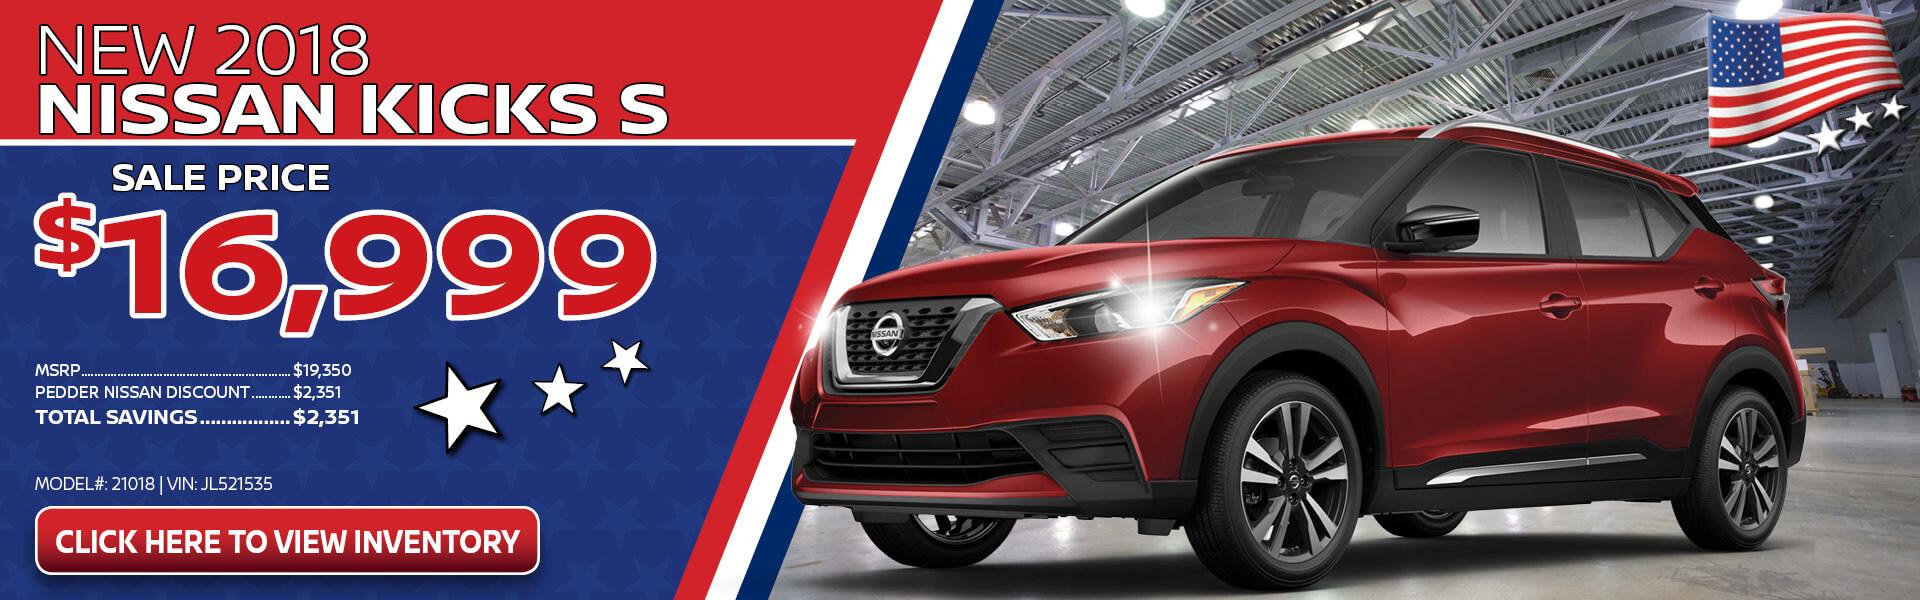 Nissan Kicks $16,999 Purchase